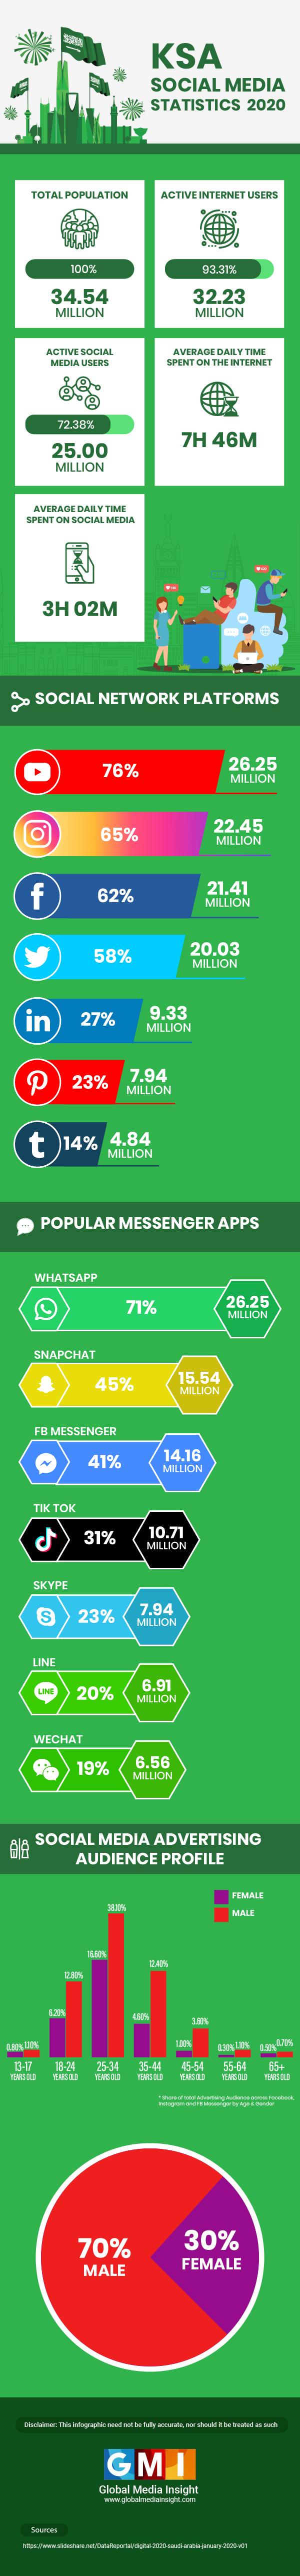 Saudi Arabia Social Media Statistics 2020 #infographic  #Social Media #Social Media Statistics #KSA Social Media Statistics #infographics #Statistics